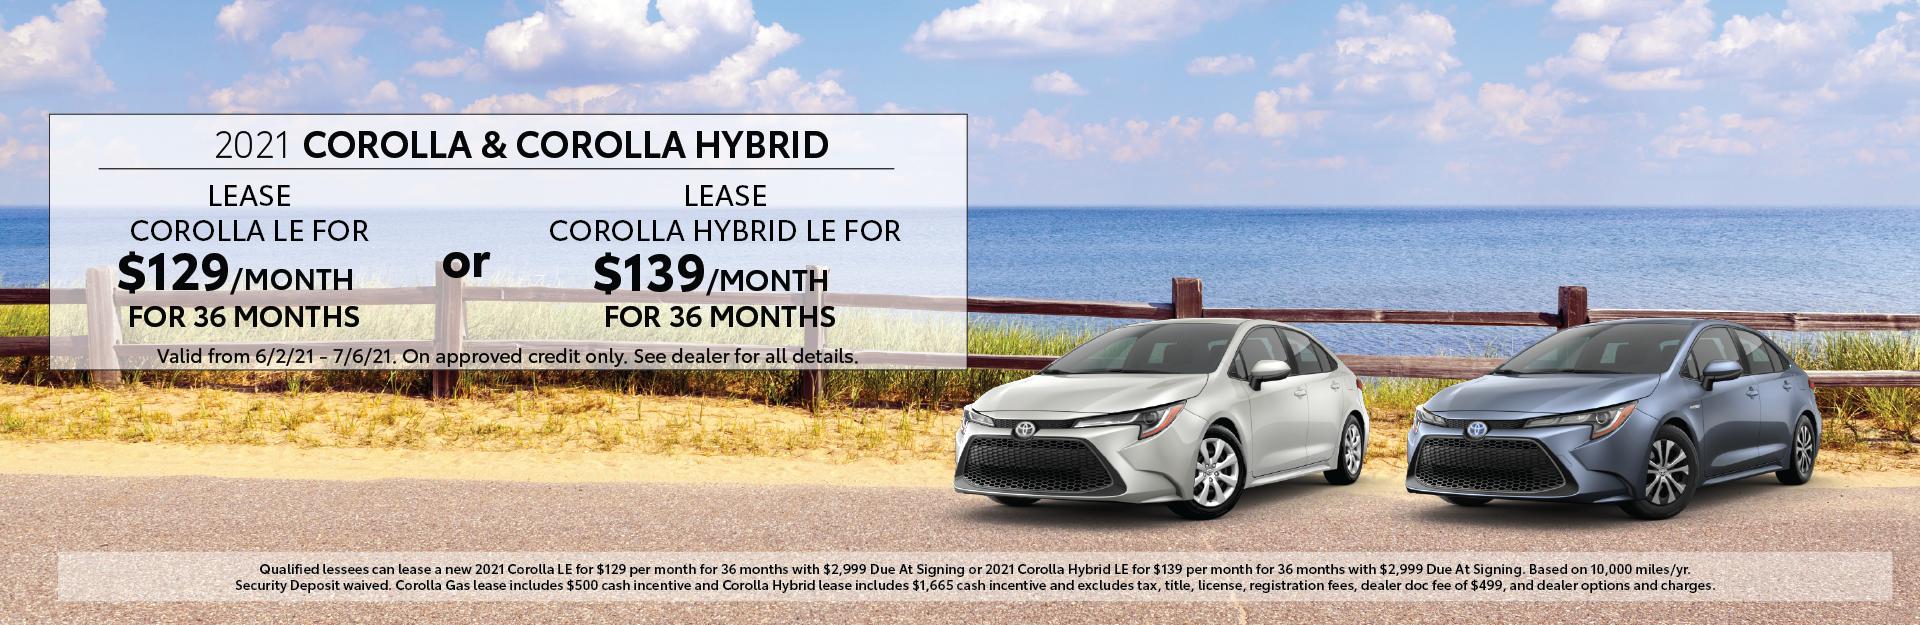 June 2021 – Corolla Offers – Lynch Homepage